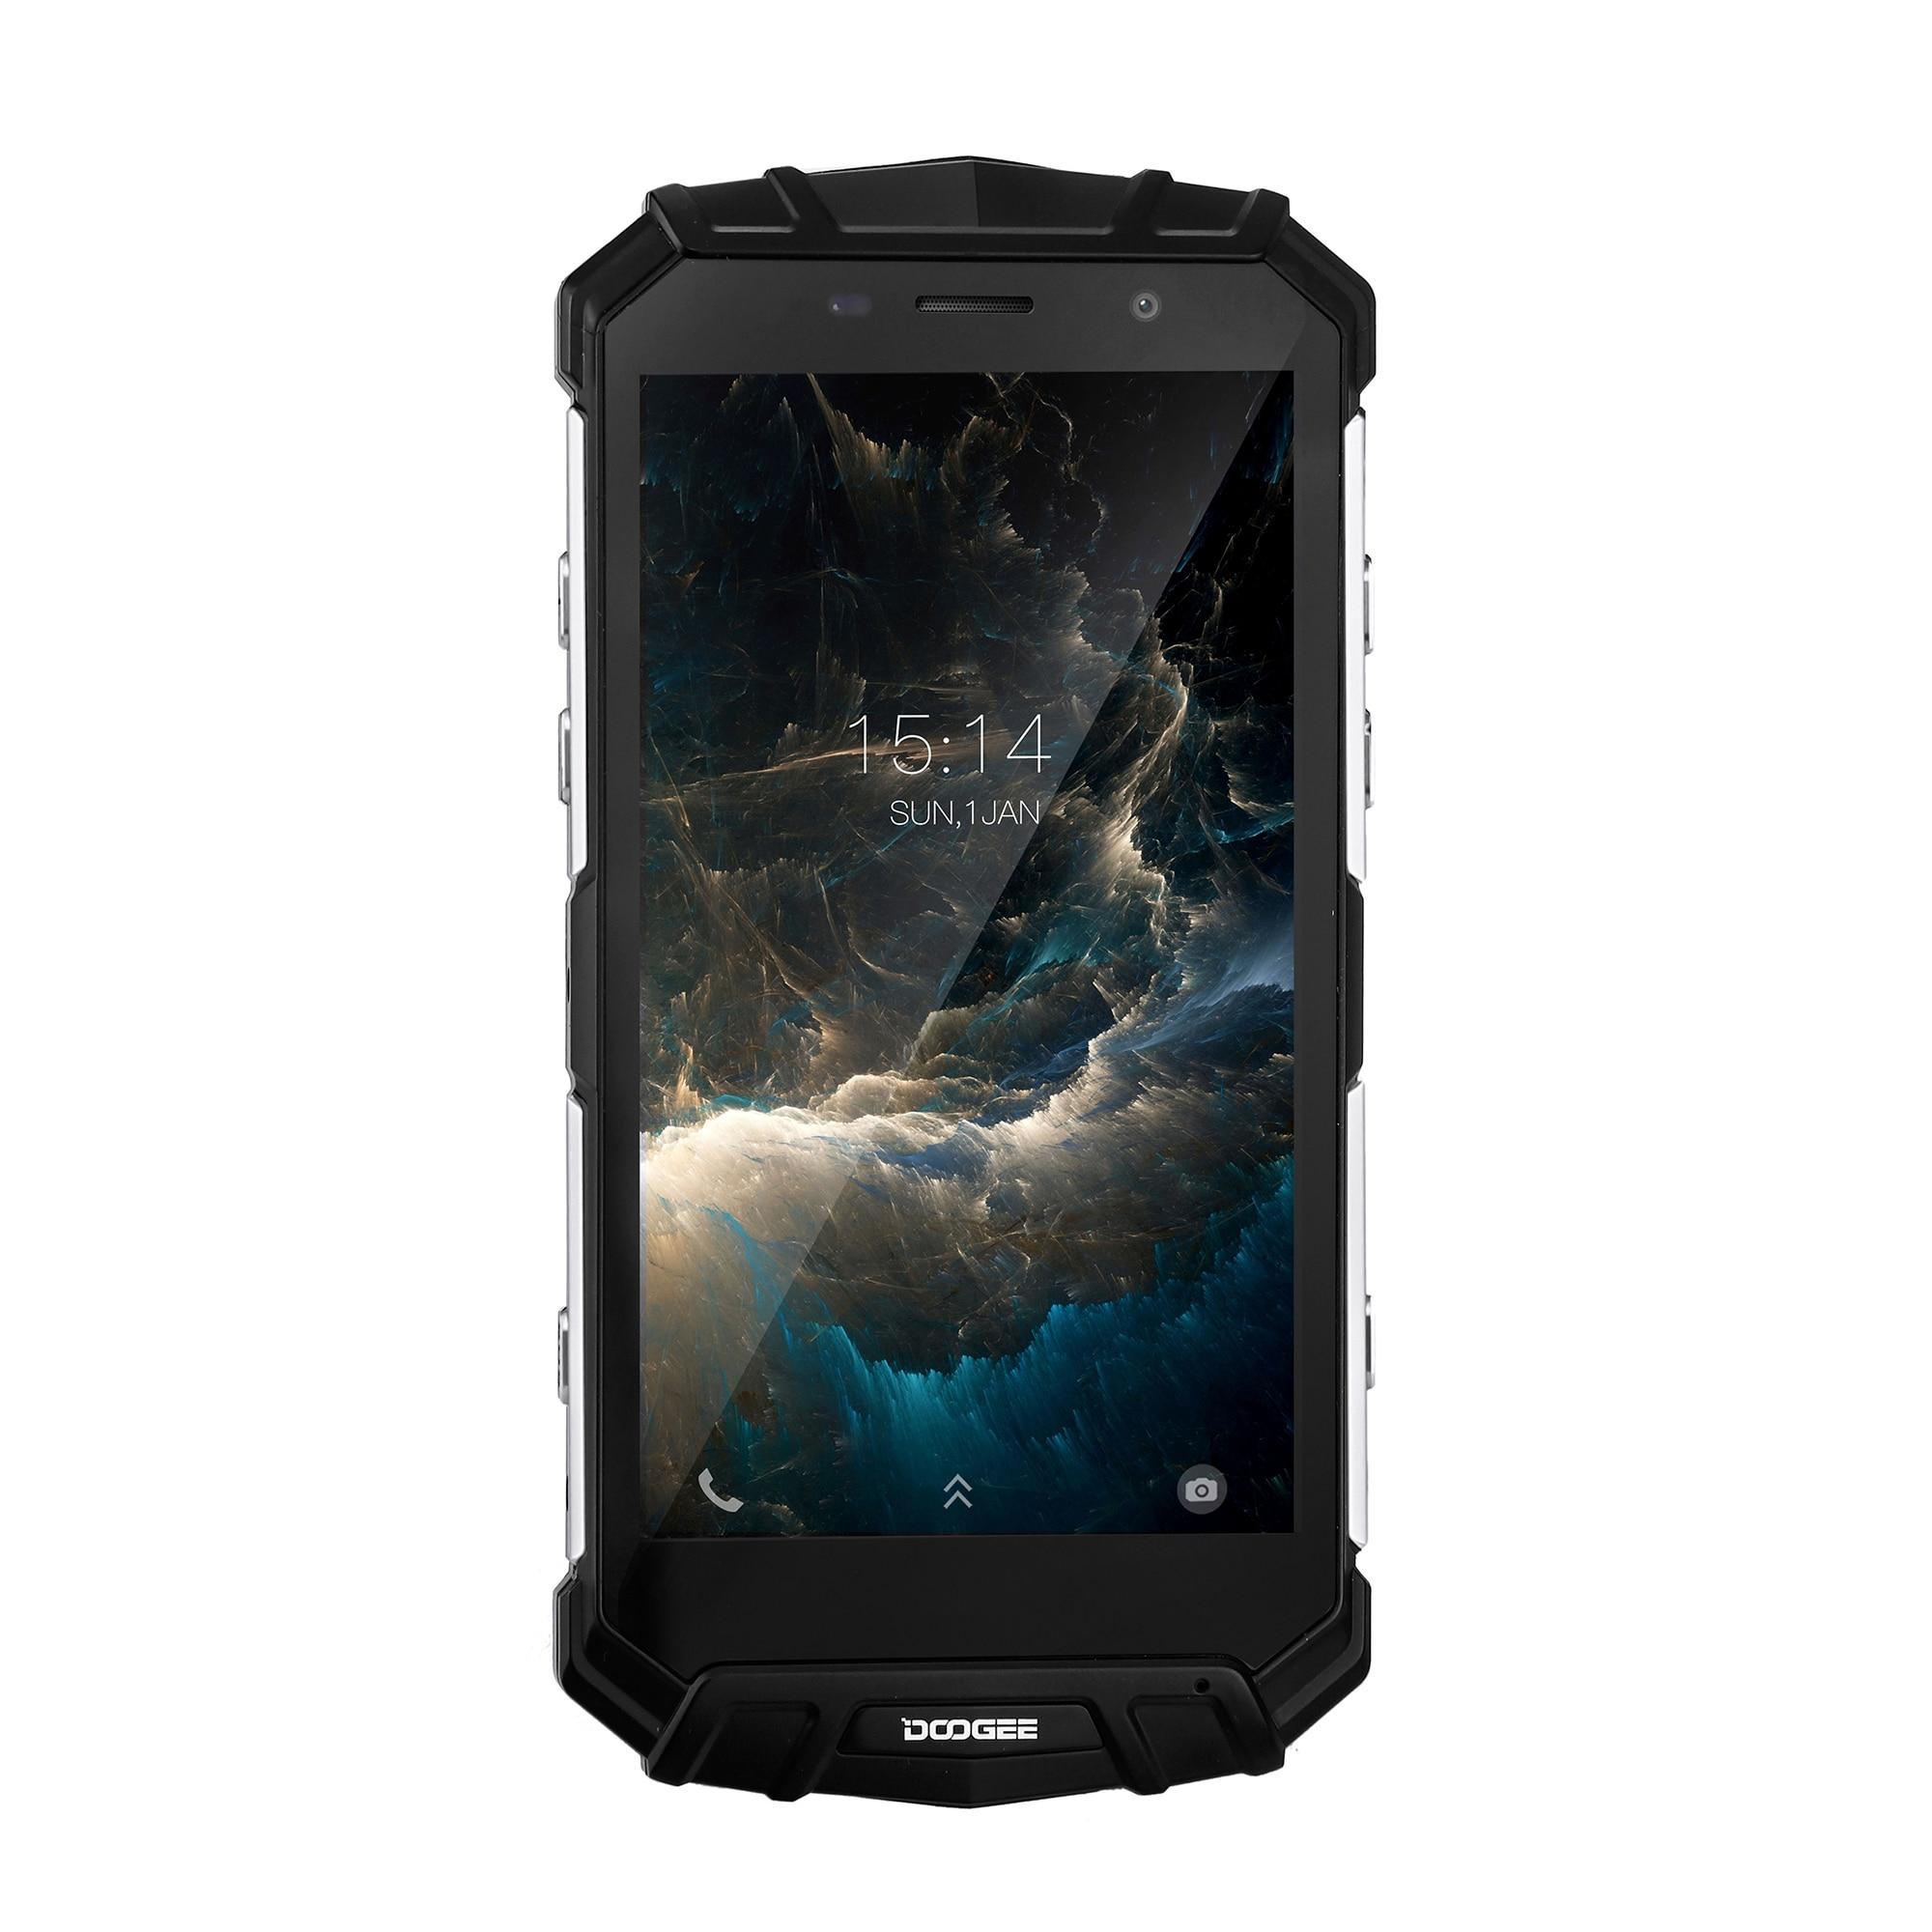 "Doogee S60 Lite IP68 4G Smartphone Android 7.0 NFC Draadloze Lading Water/Stofdicht 5580mAh 5.2 ""4 GB + 32GB Touch ID Mobiele telefoon"